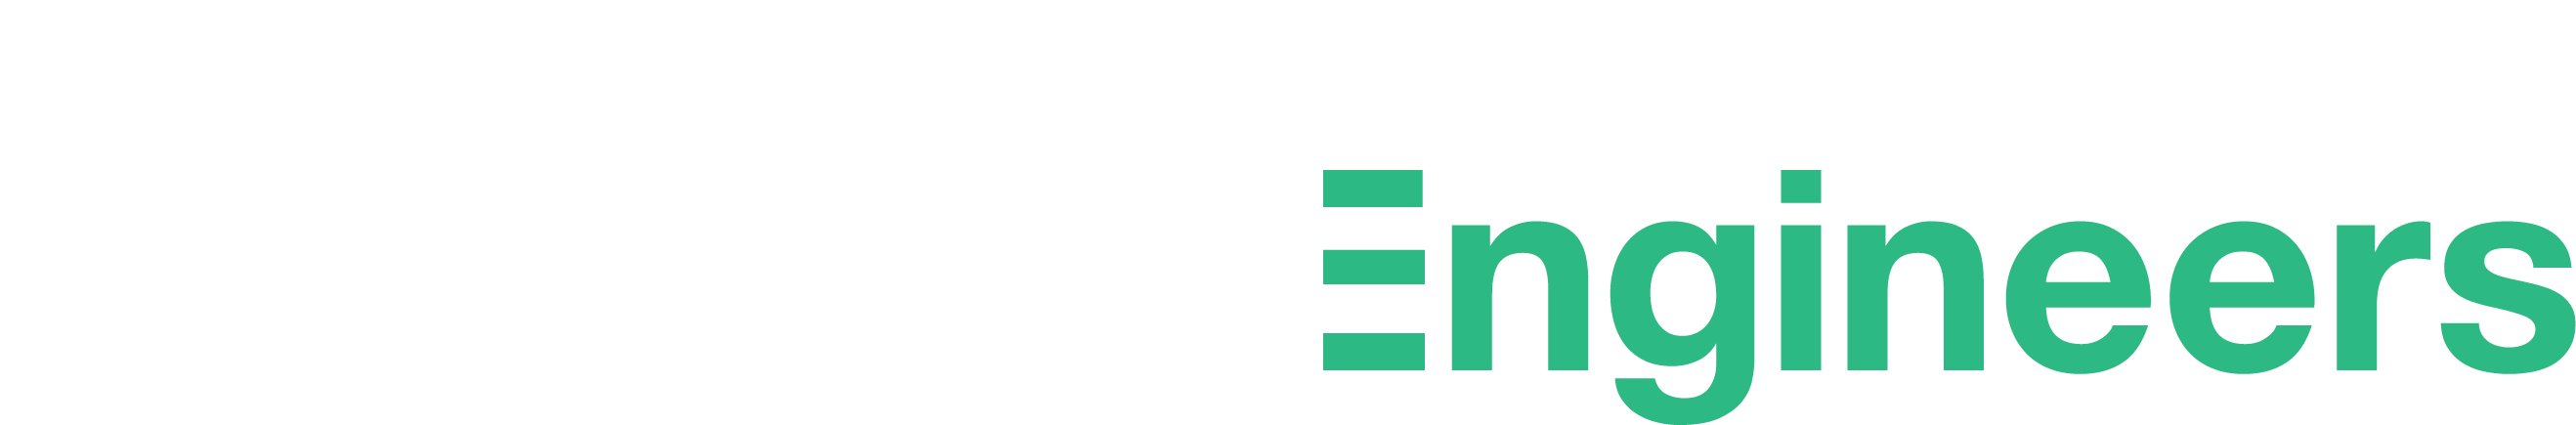 ISE_Logo_RGB_Reversed